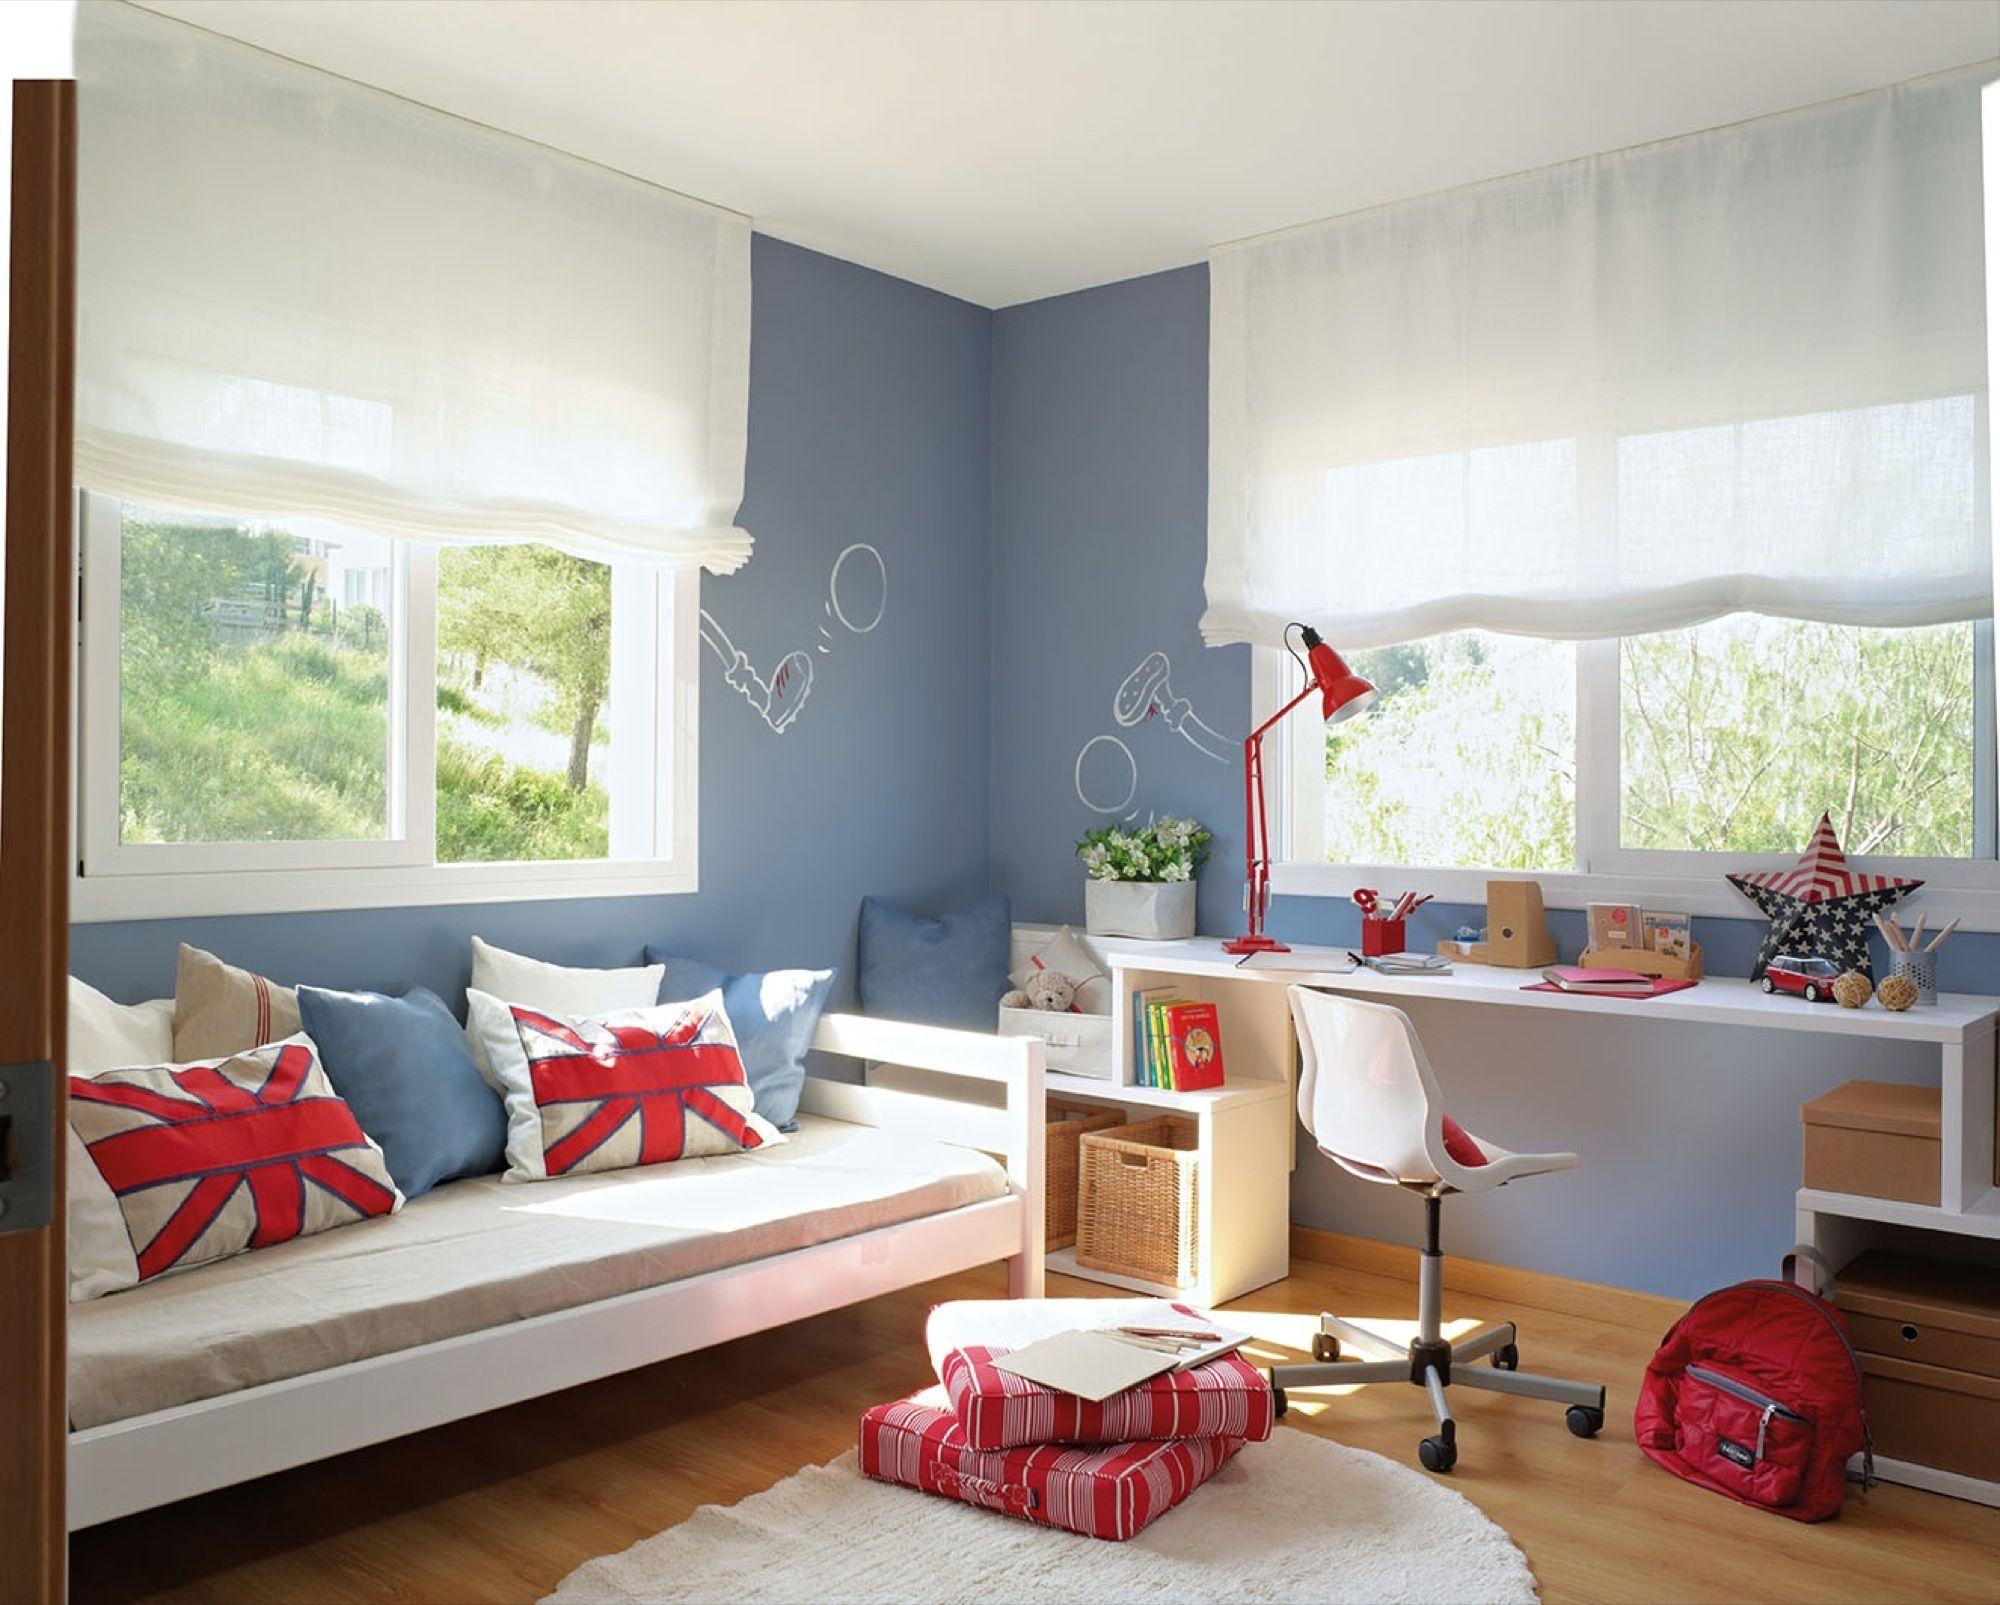 C Mo Pintar La Casa Sin Ayuda De Un Pintor Profesional Nos Gusta  ~ Ideas Para Decorar Dormitorio Juvenil